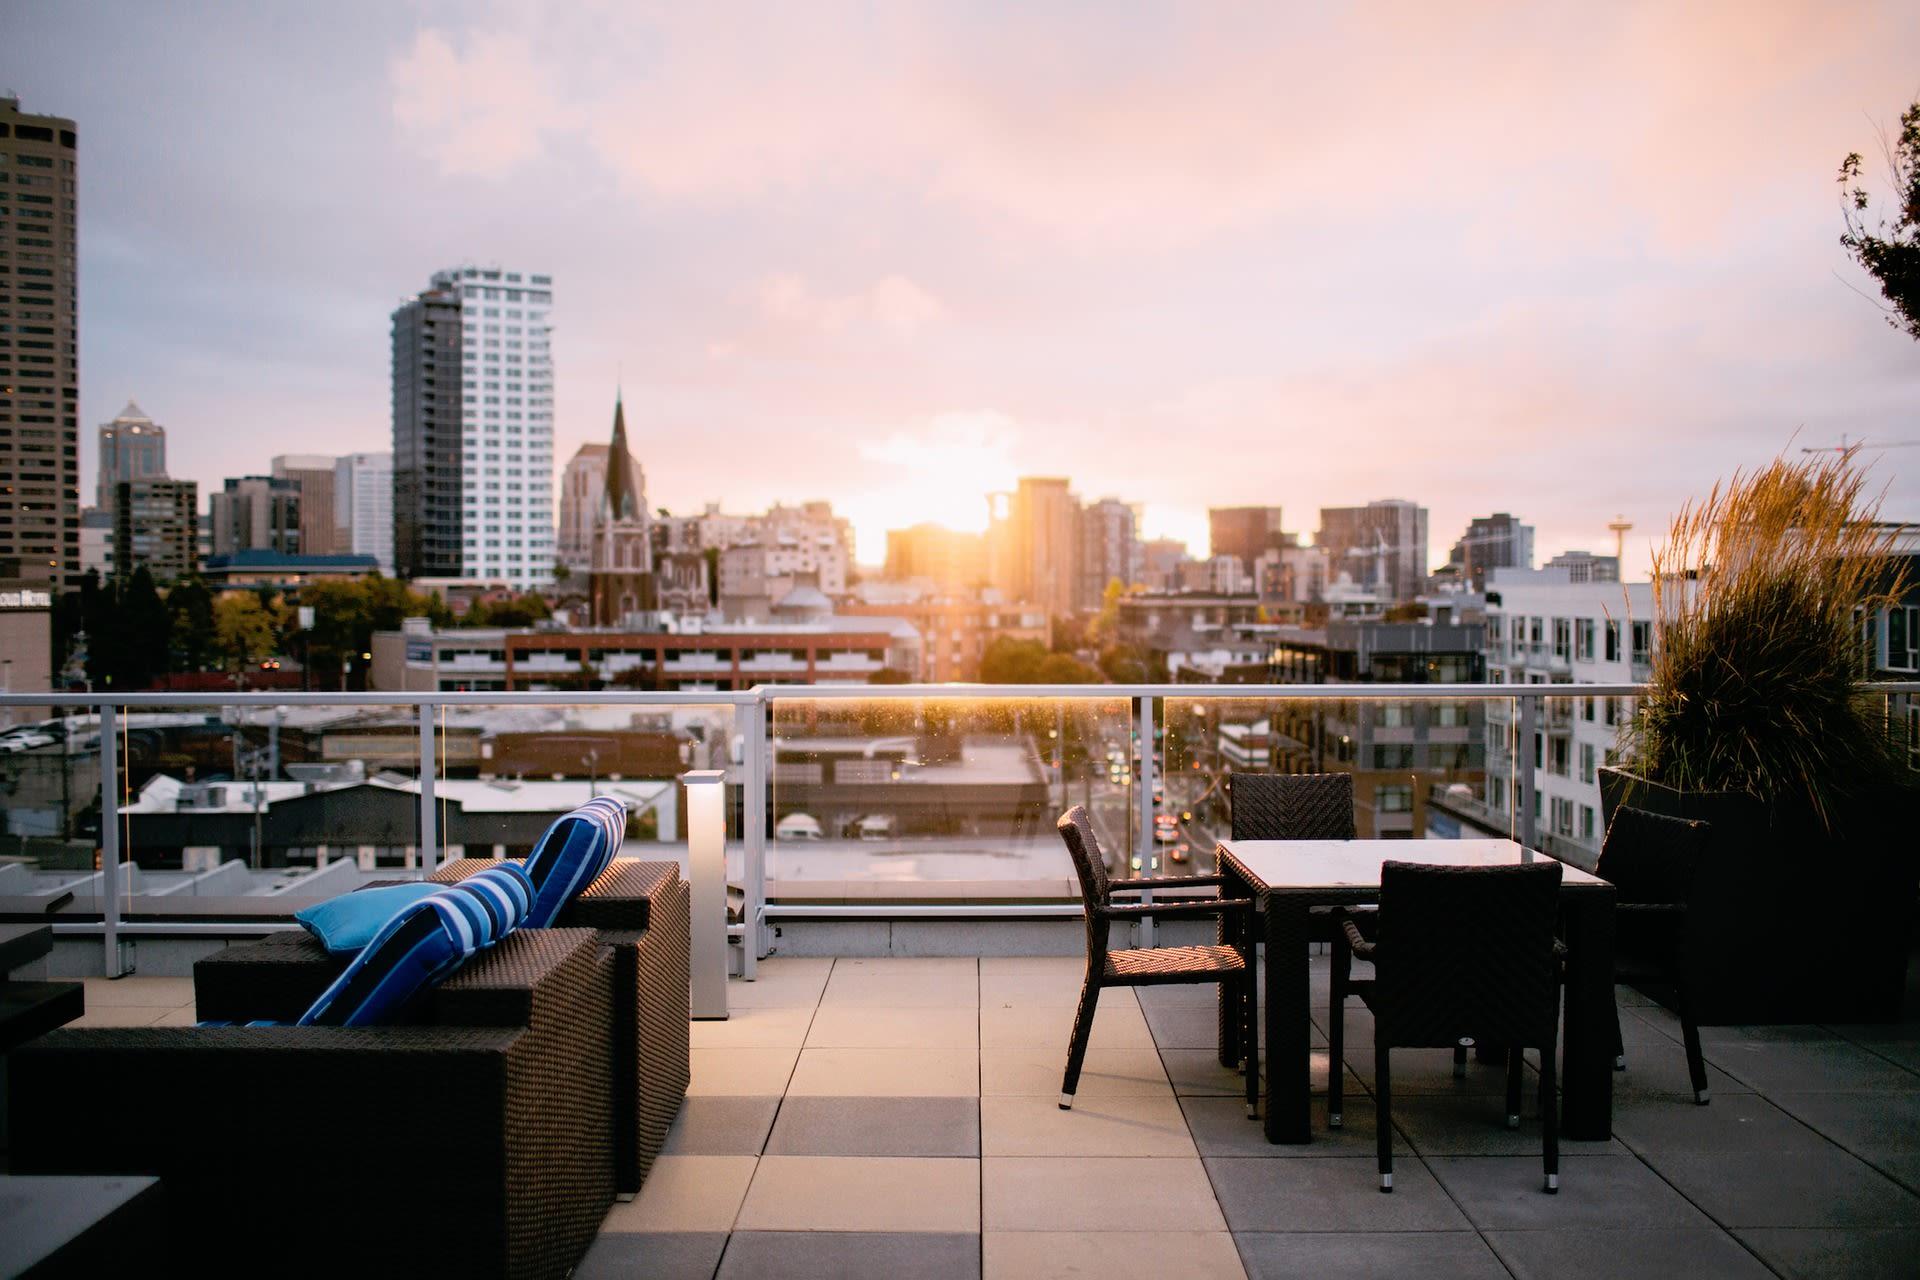 Condos & Townhomes, $351k – $700k